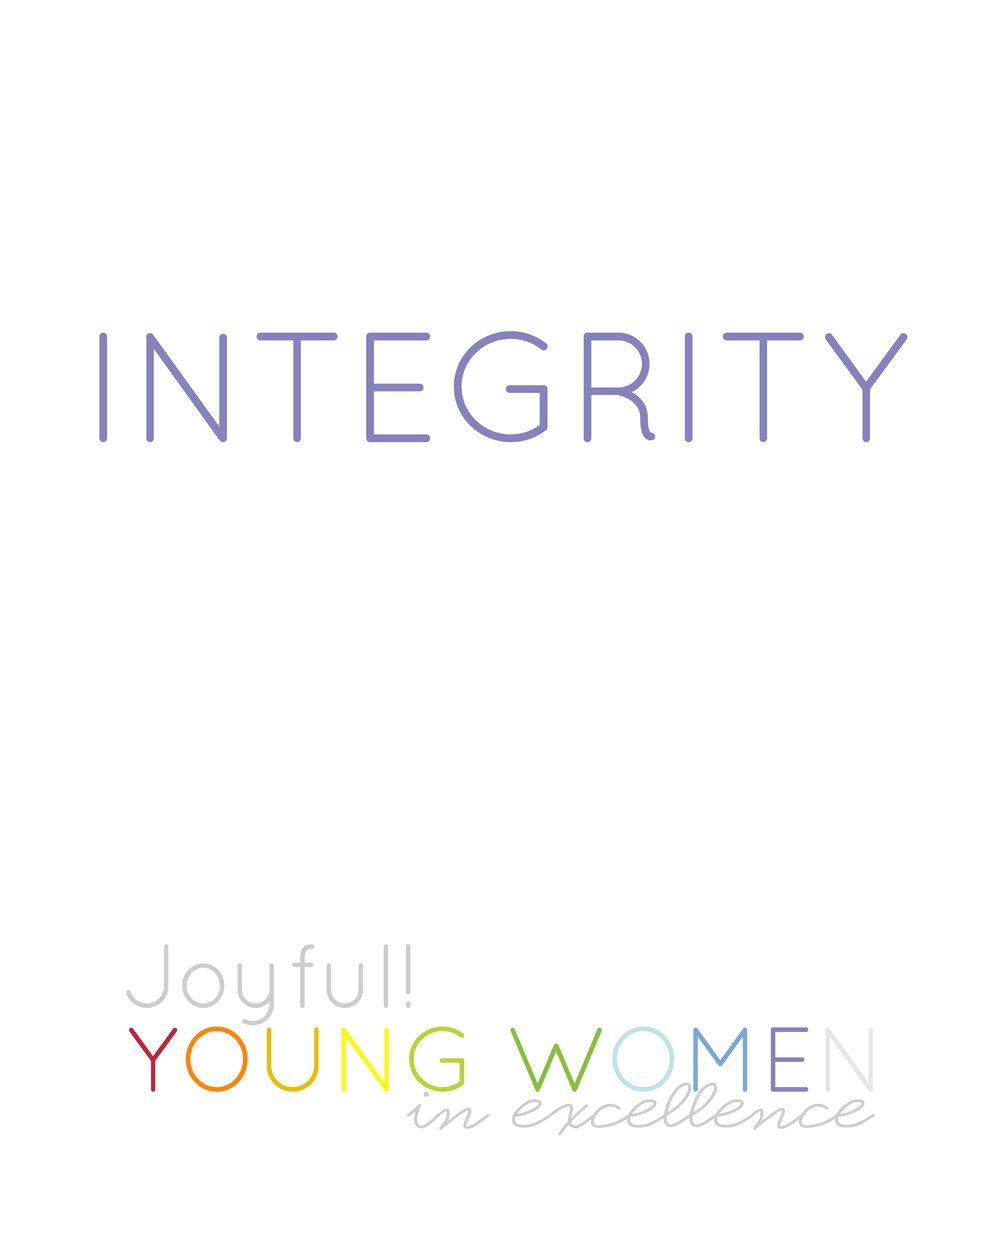 Amber Brittain-Hale November 2016 Integrity.jpg